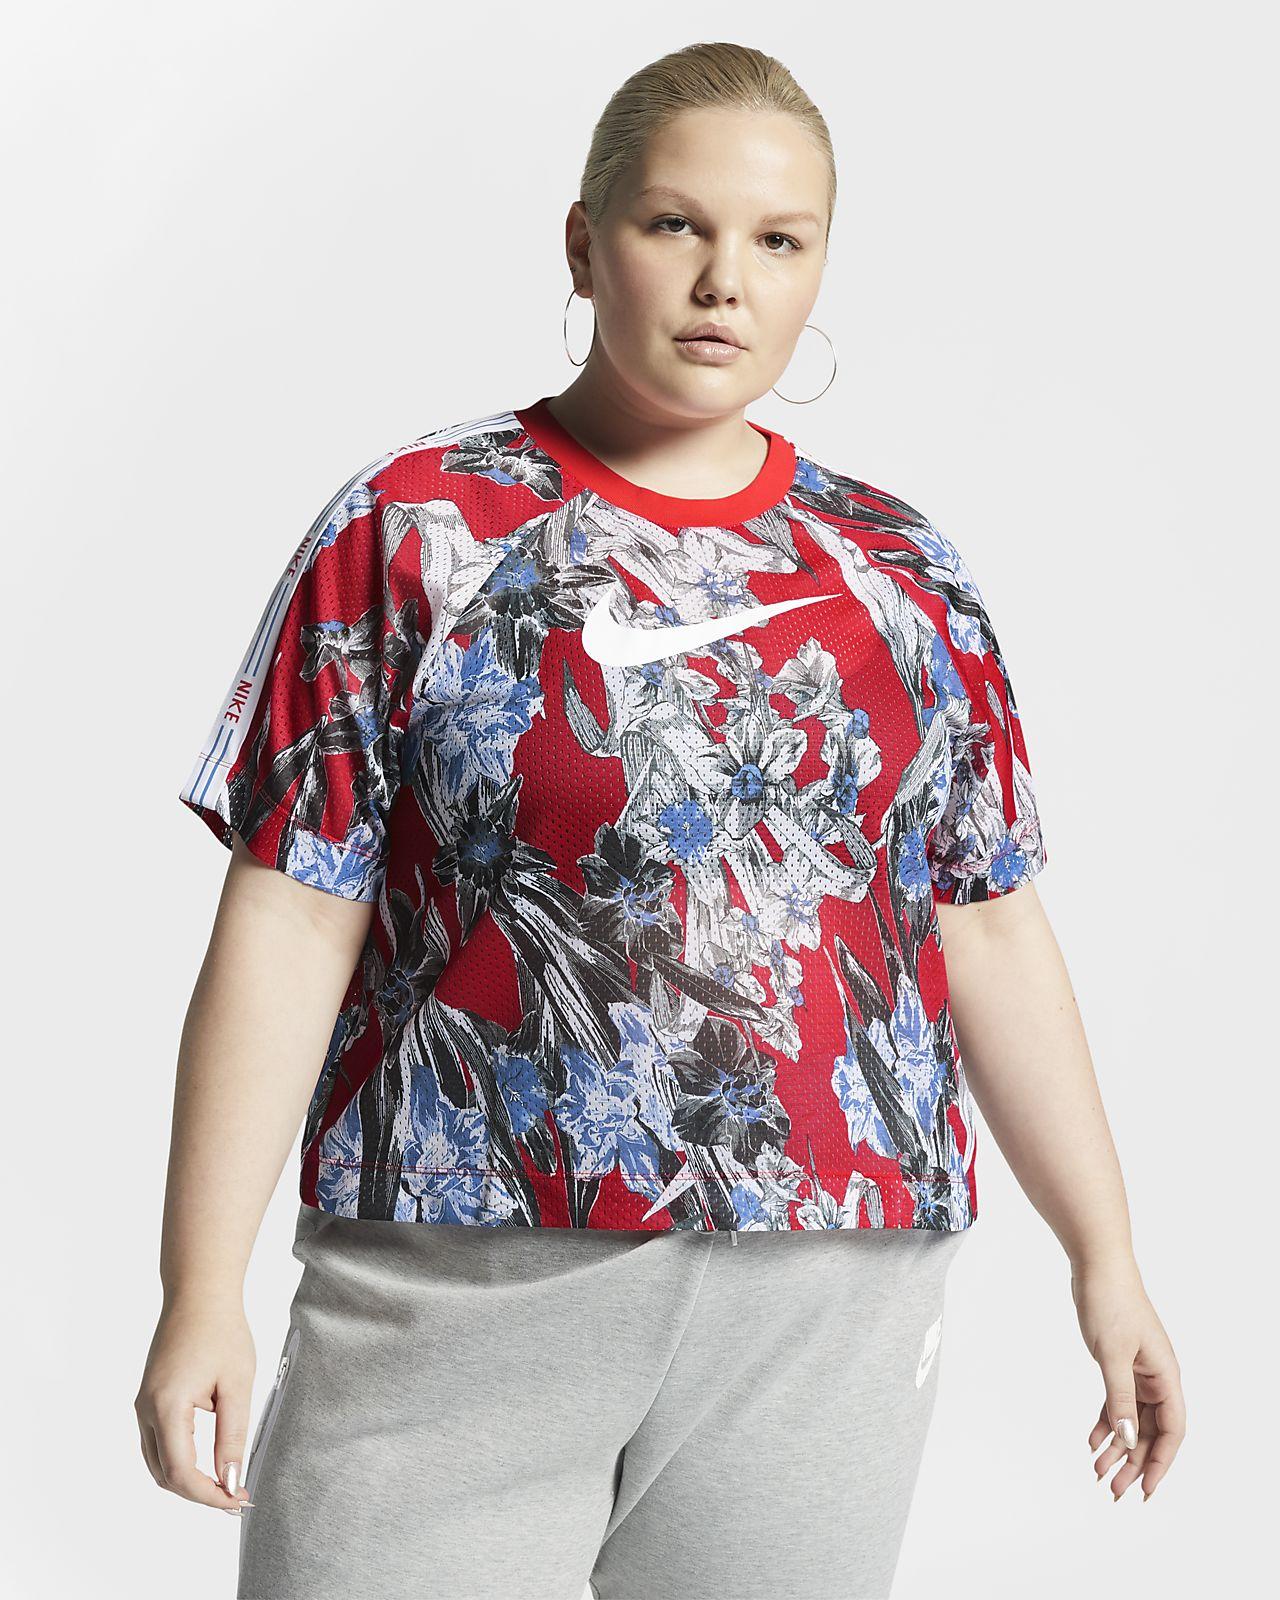 e9468302d0e6 ... Γυναικεία κοντομάνικη φλοράλ μπλούζα Nike Sportswear (μεγάλα μεγέθη)